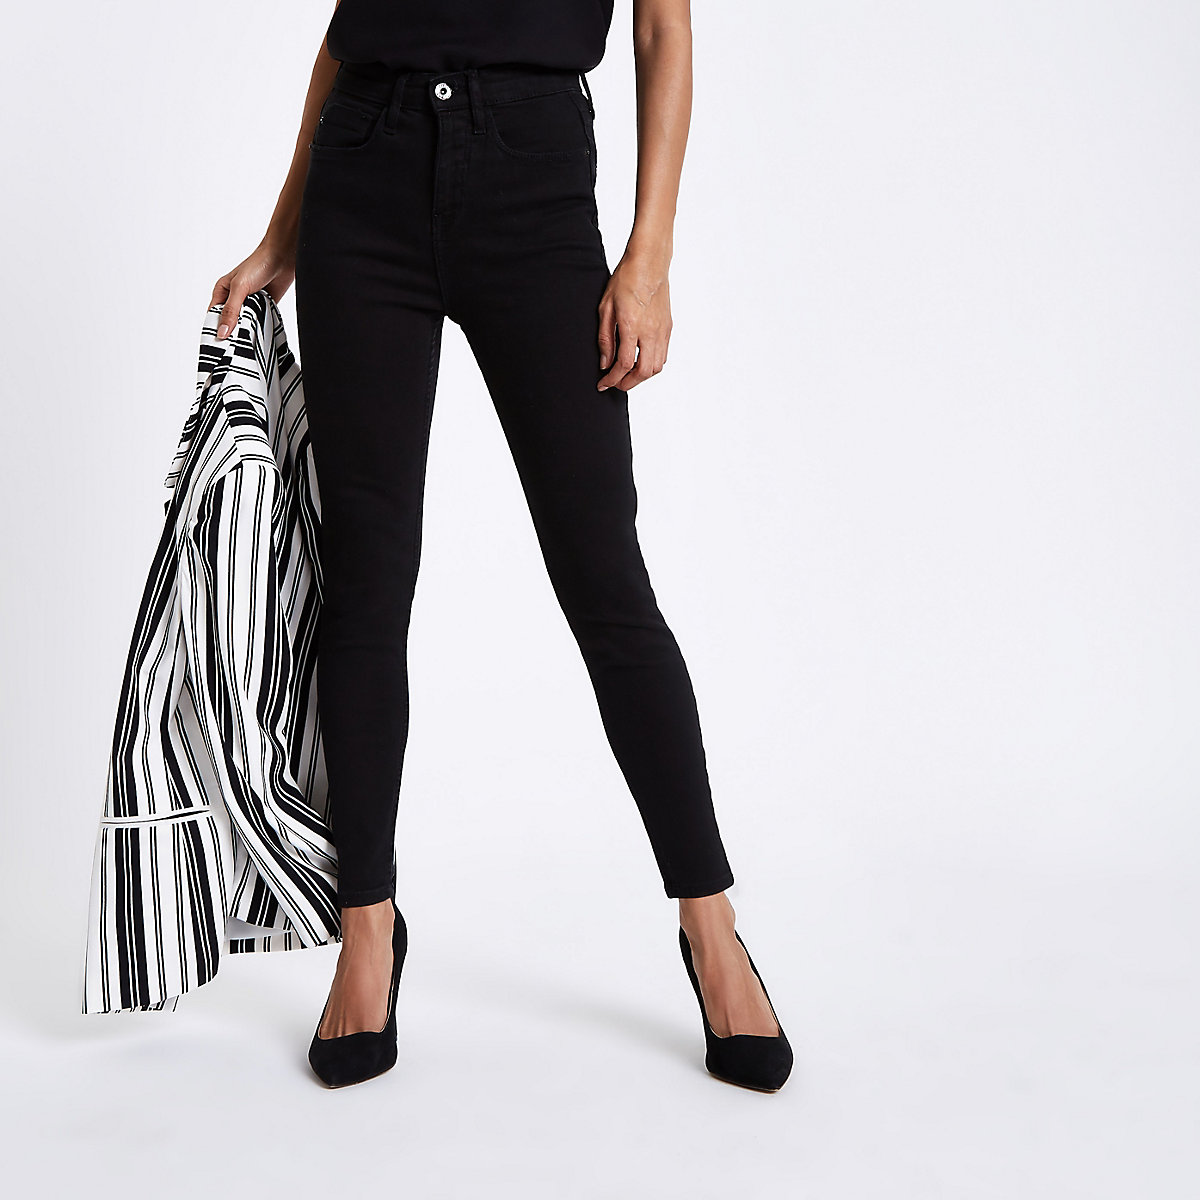 Petite black Harper high waisted skinny jeans